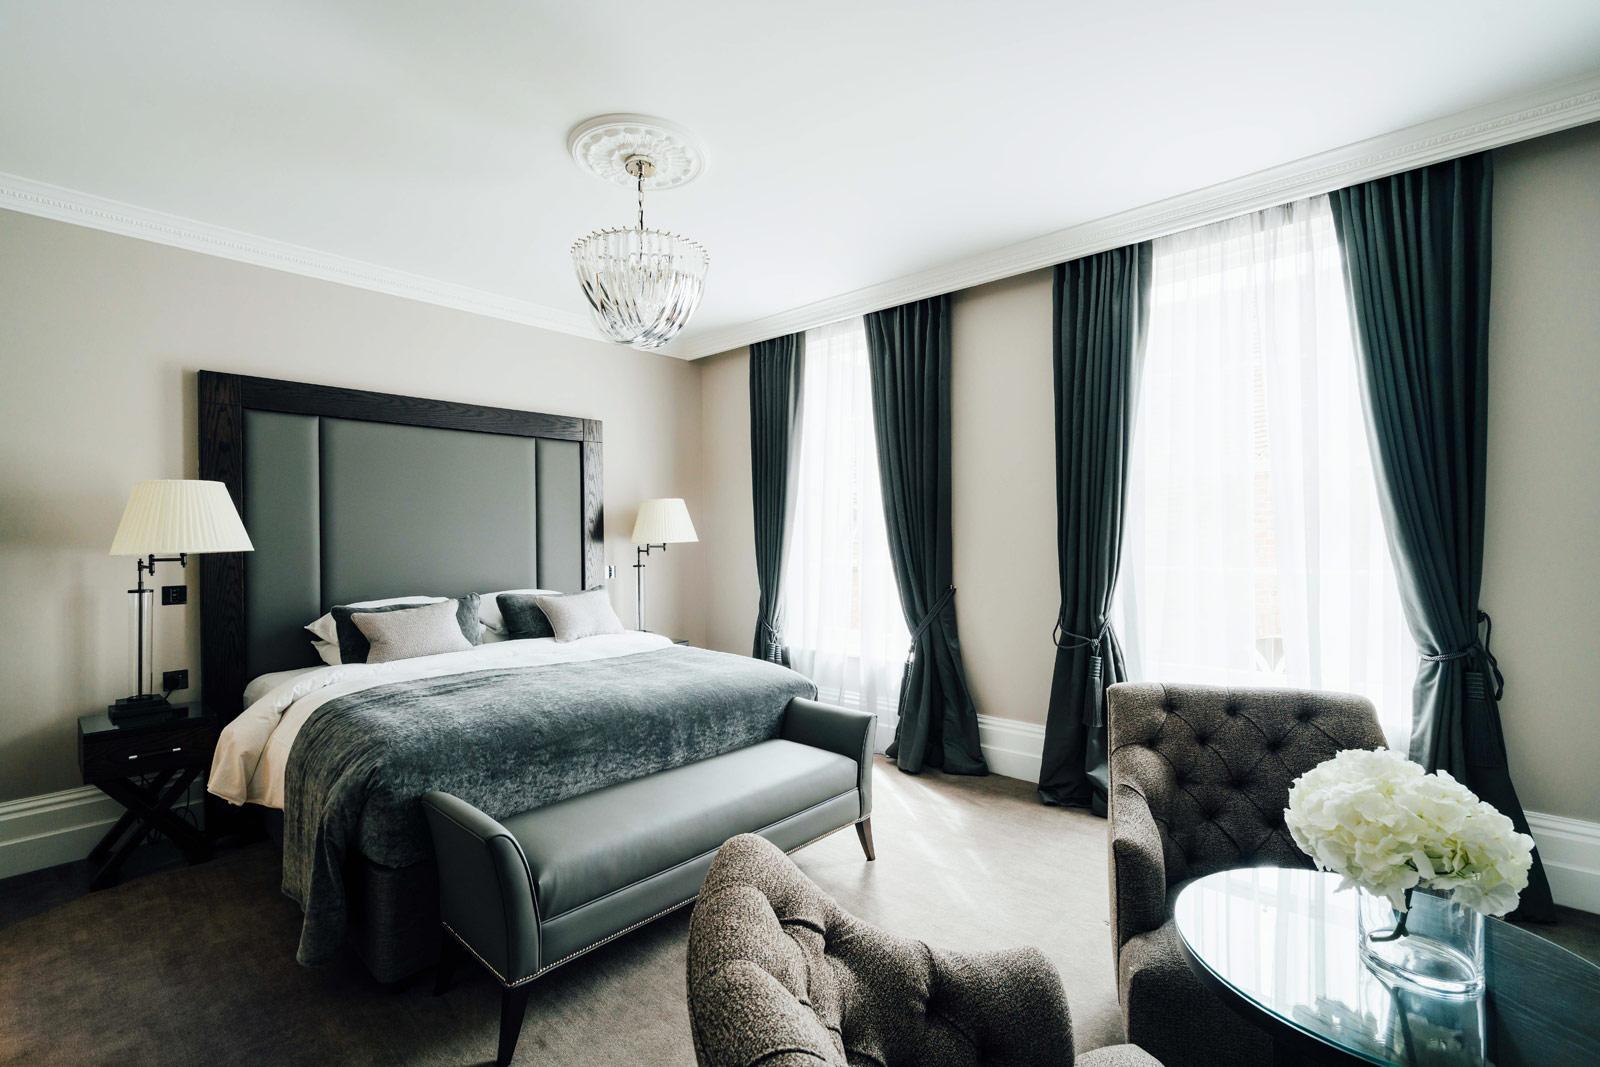 Abstract bedroom art